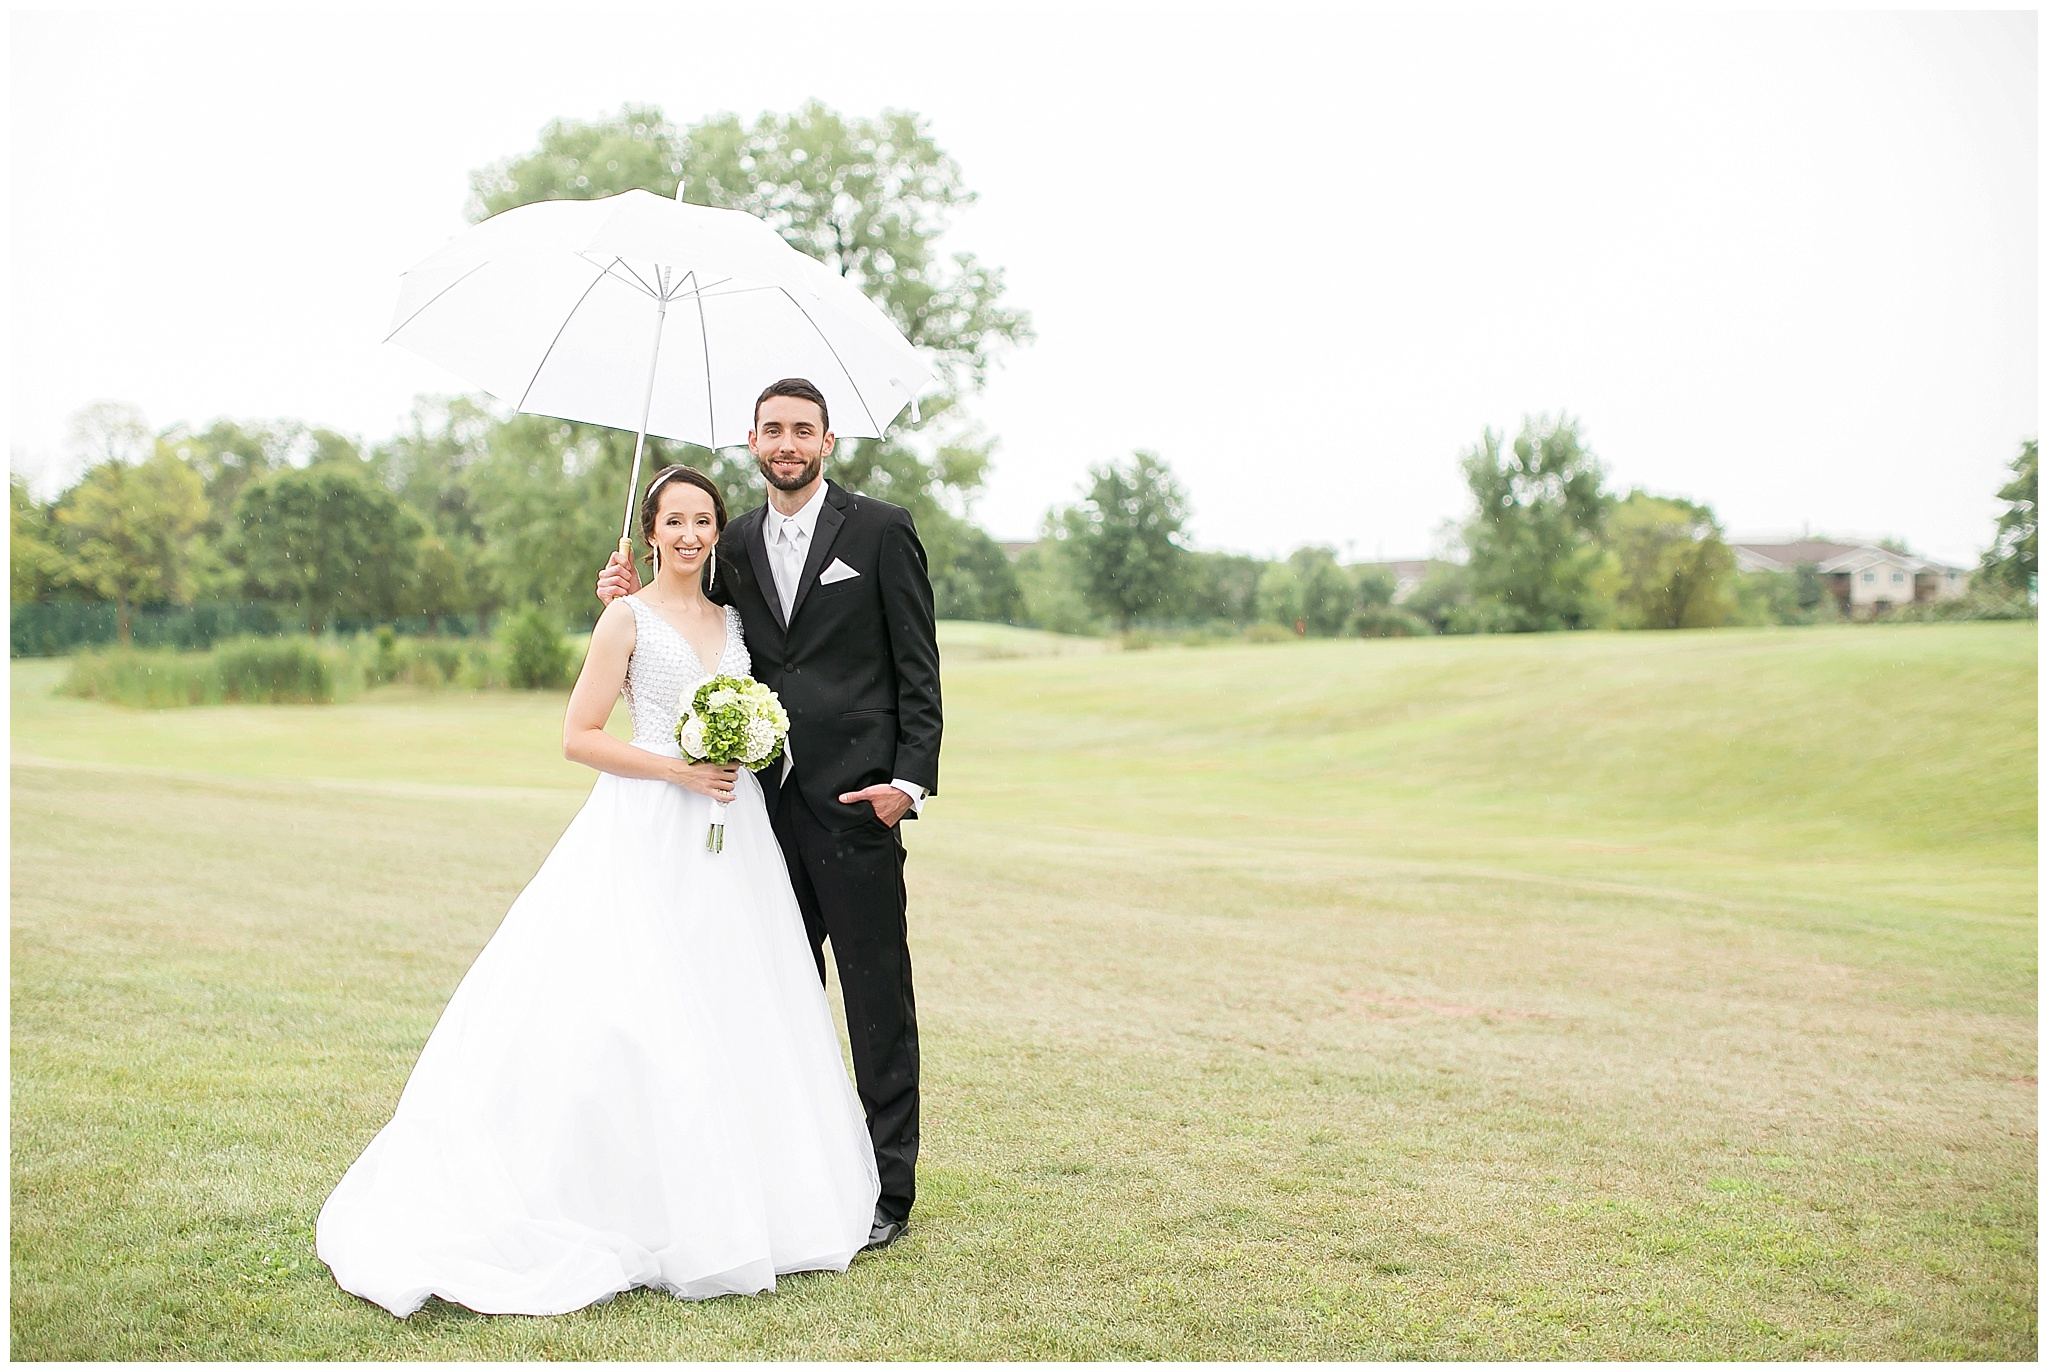 bridgewood_resort_wedding_neenah_wisconsin_0324.jpg